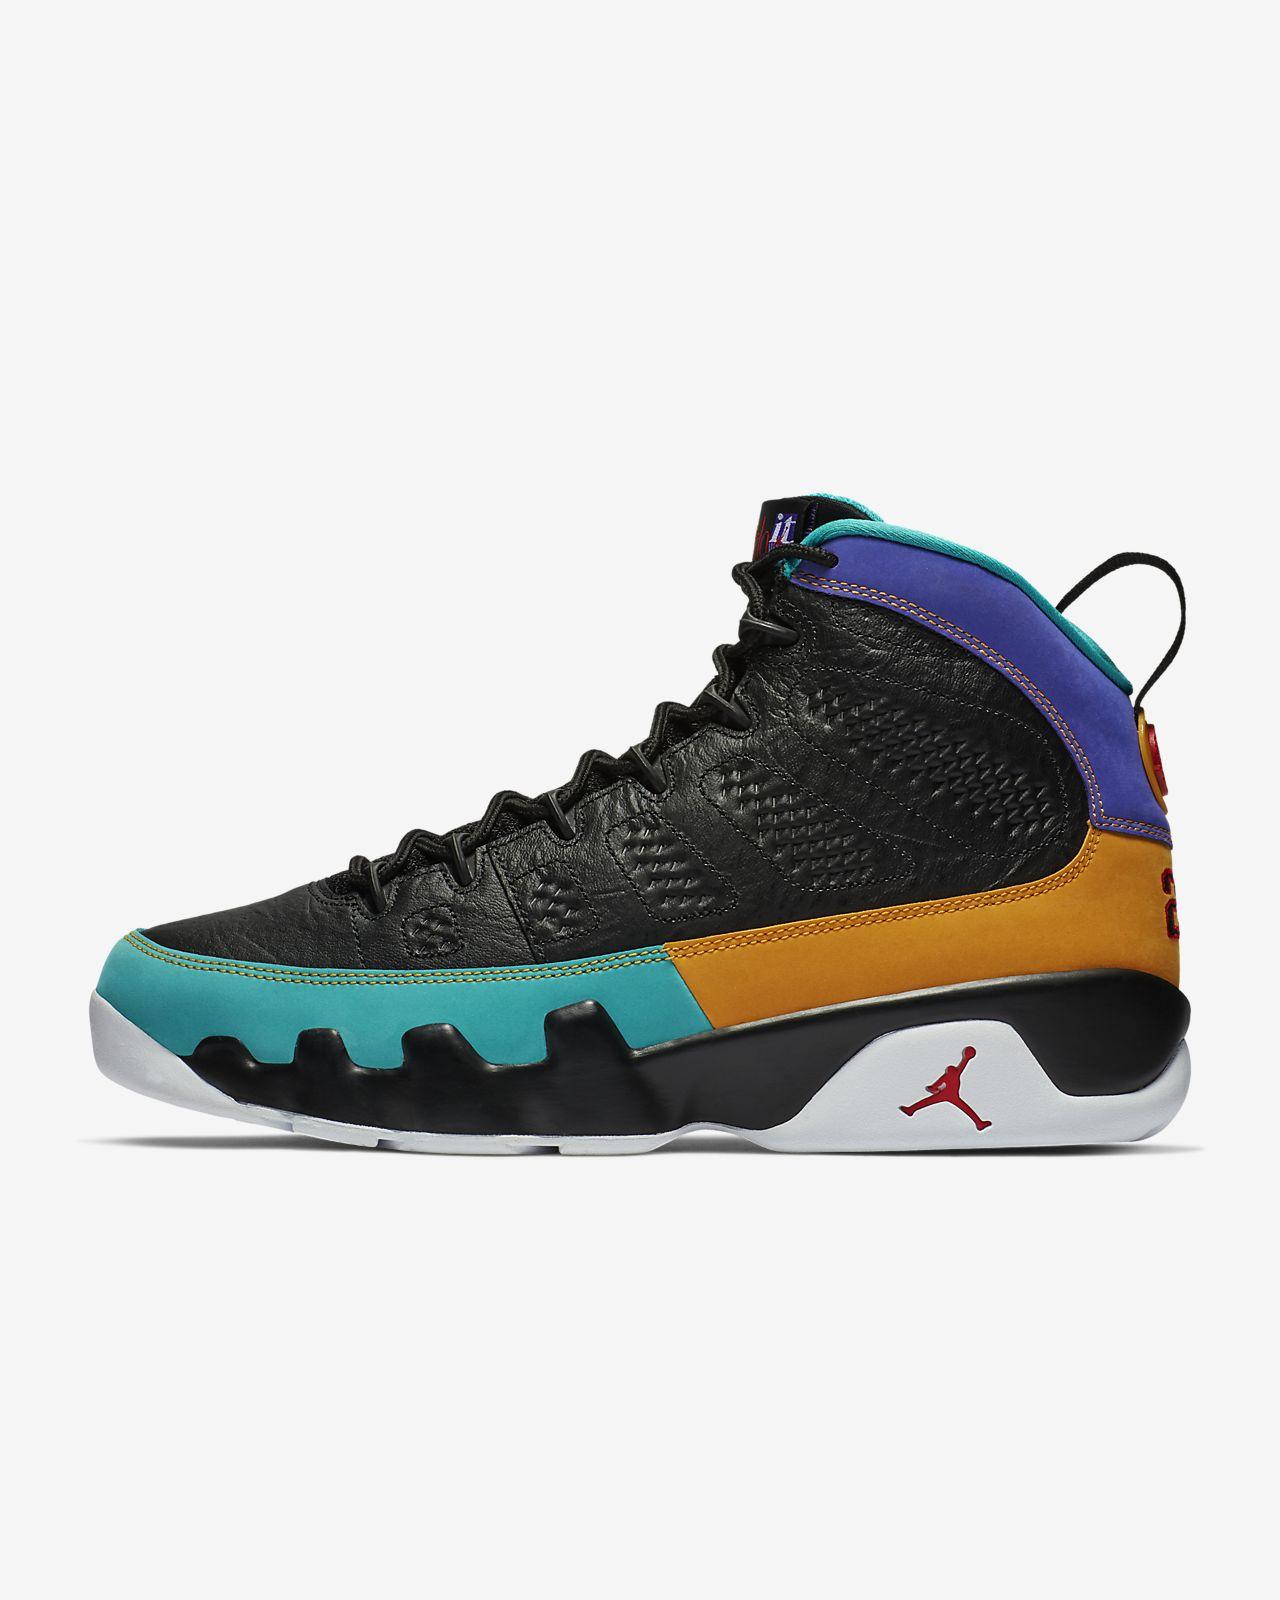 c49ef73605c Air Jordan 9 Retro Men's Shoe. Nike.com IN